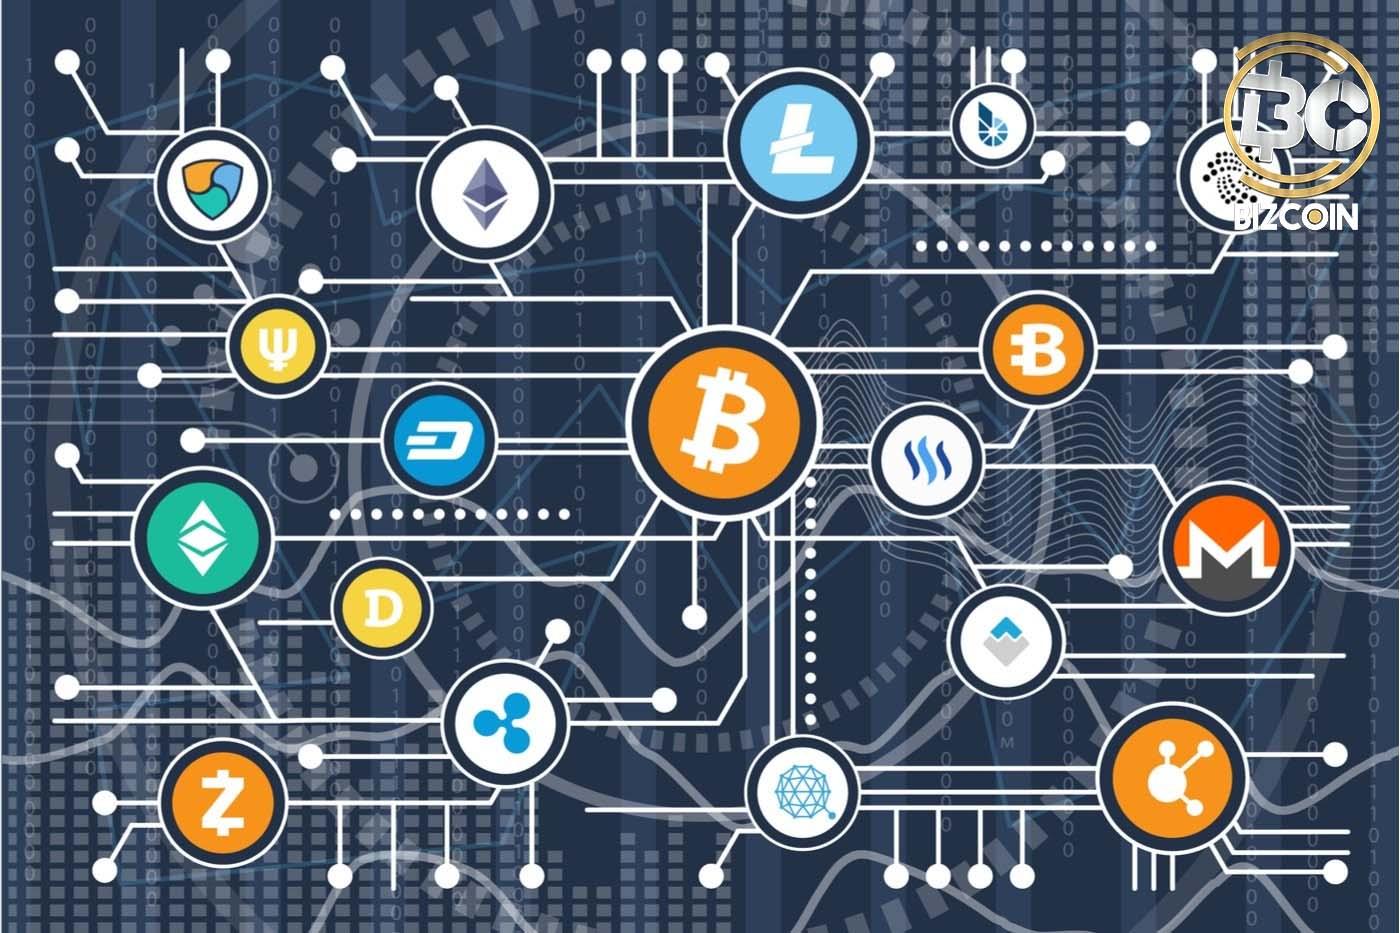 buy crypto currency 2 آیا می توان با خرید و فروش ارز دیجیتال کسب درآمد داشت؟   آیا نوسان گیری با خرید و فروش بیت کوین امکان پذیر است؟